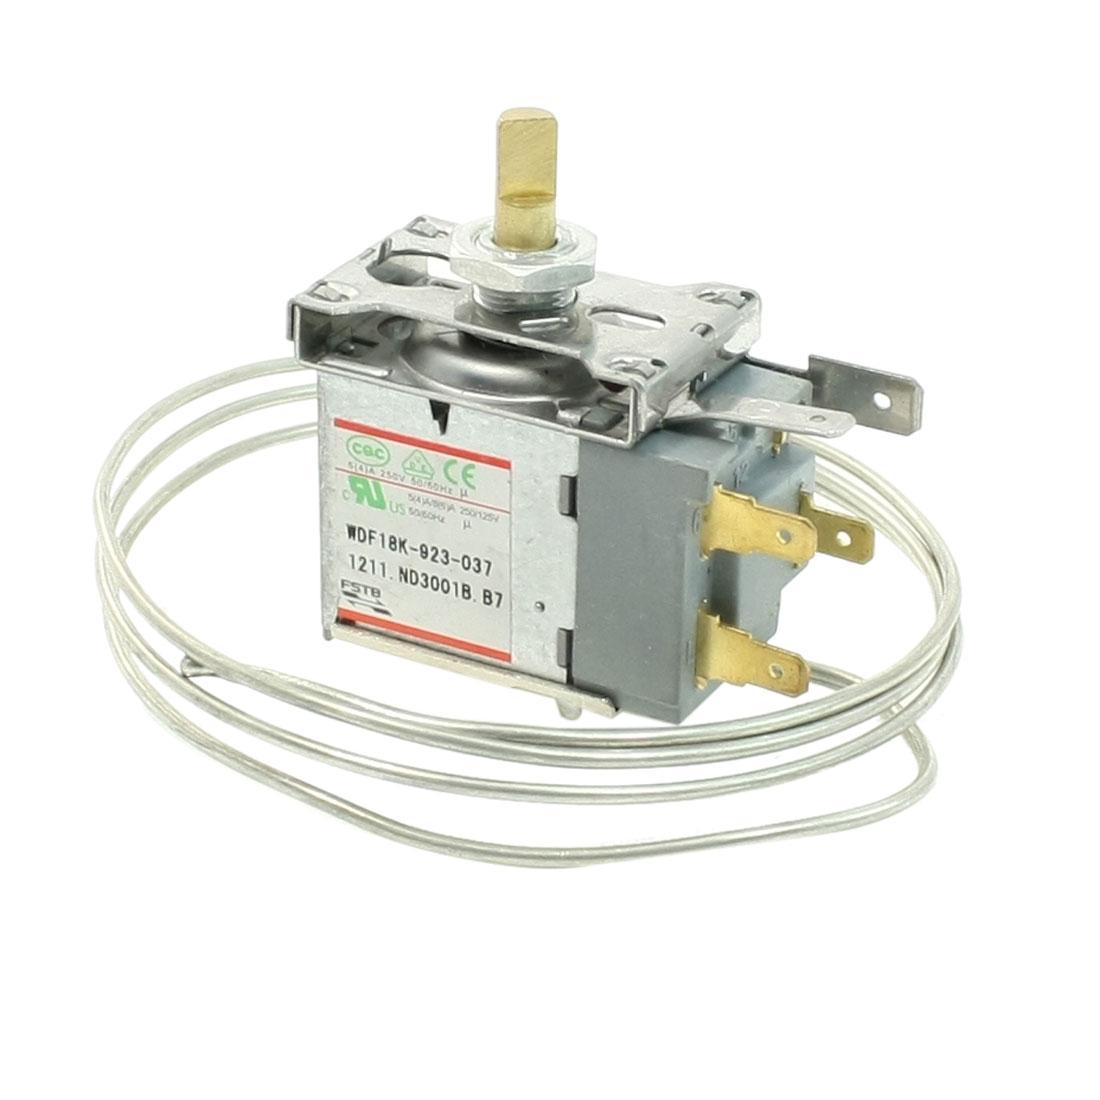 AC 250V 5A 5 Pins Refrigeration Insulated Device for Haier Refrigerators